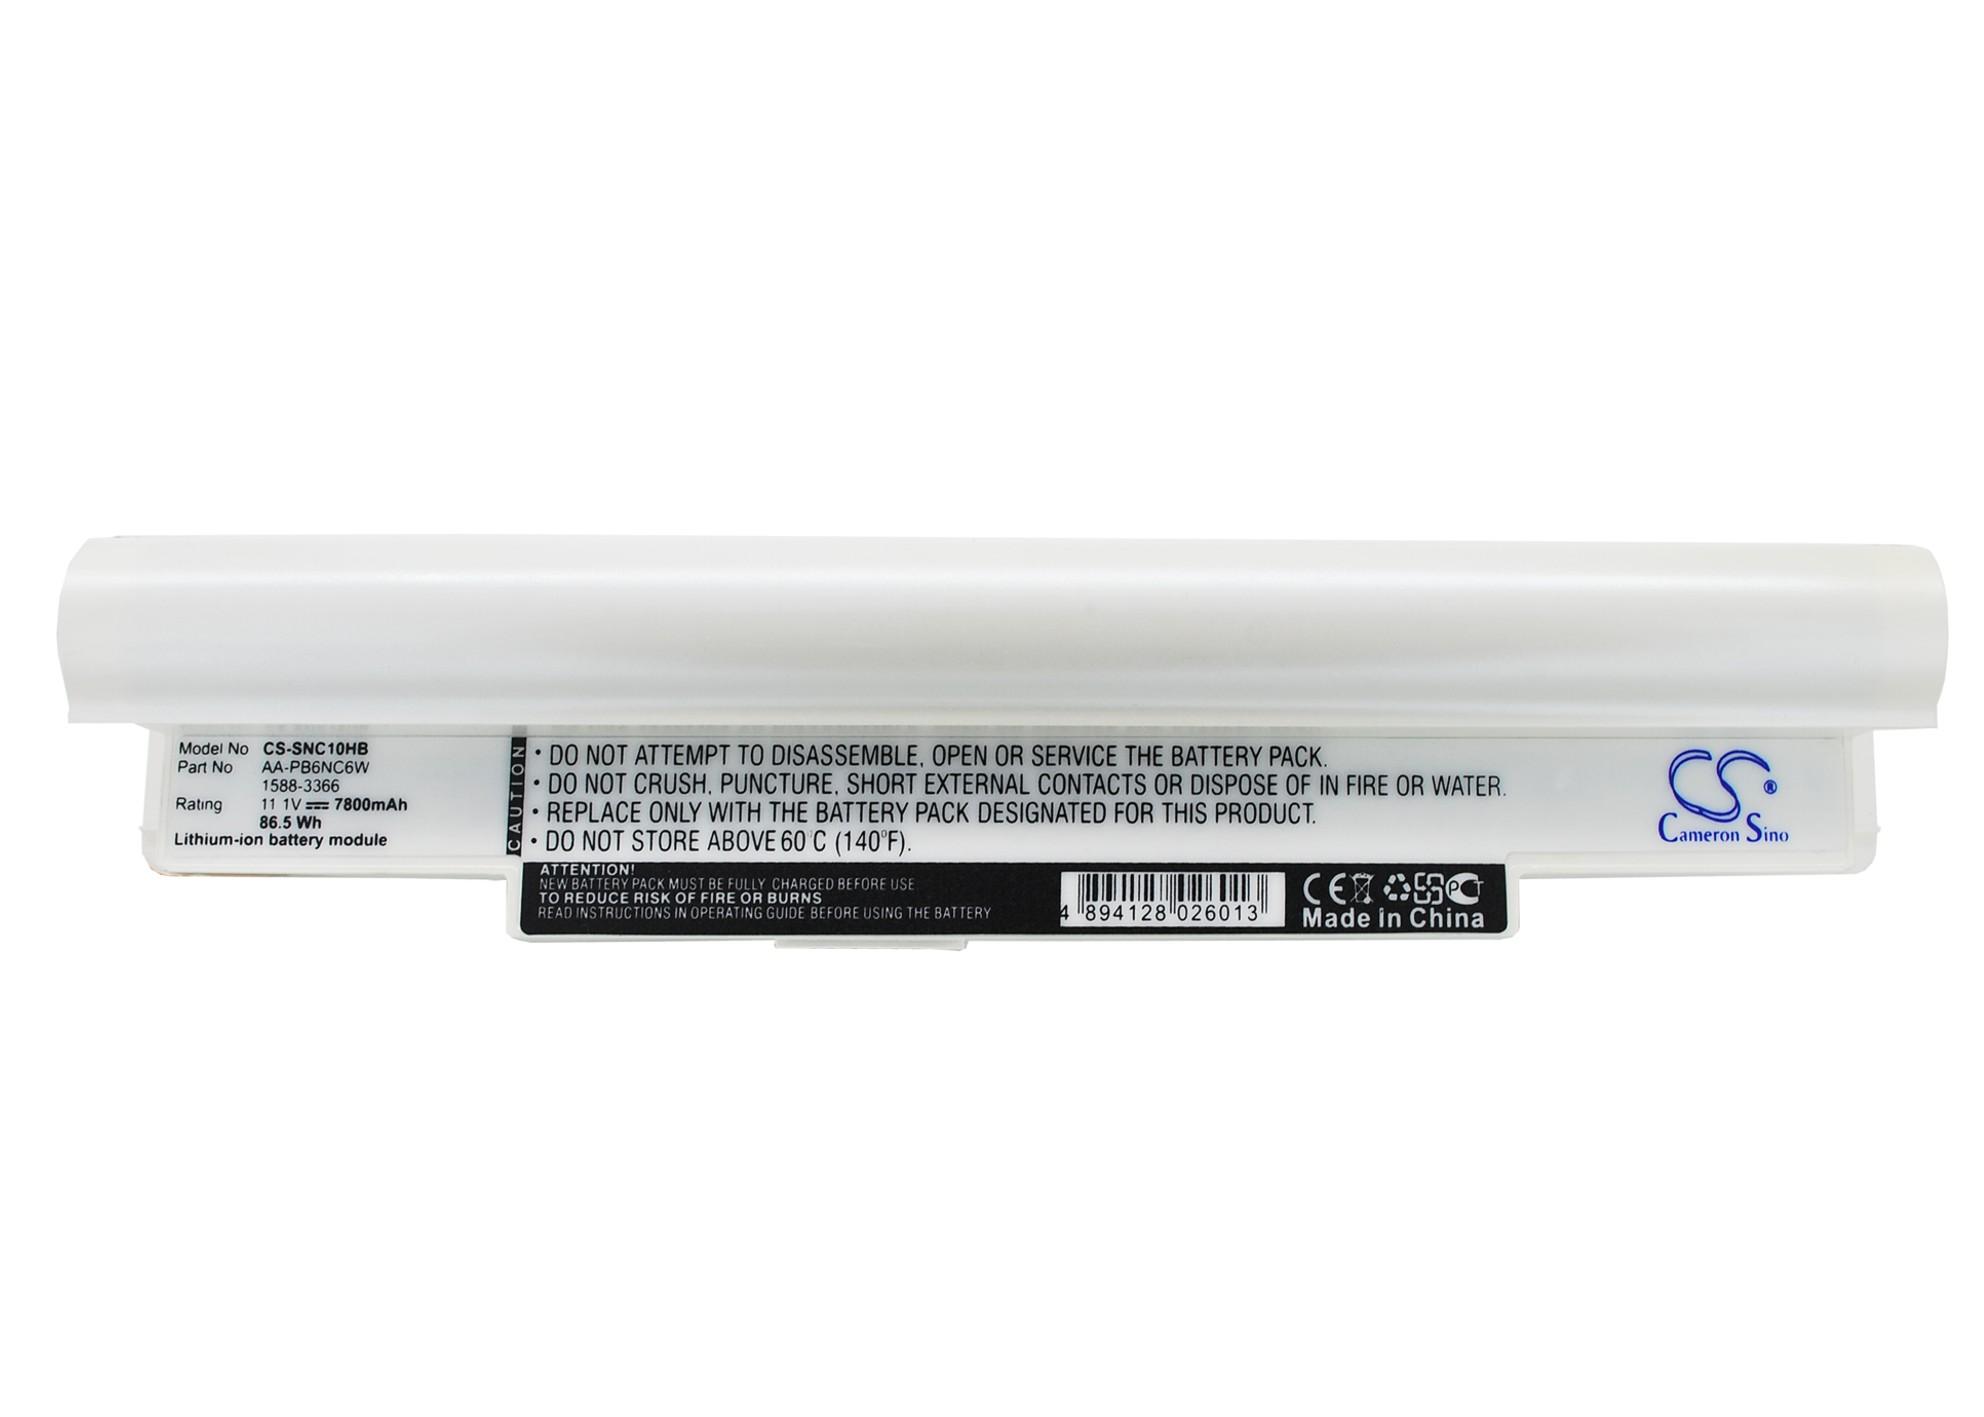 Cameron Sino baterie do notebooků pro SAMSUNG NP-NC20 11.1V Li-ion 7800mAh bílá - neoriginální